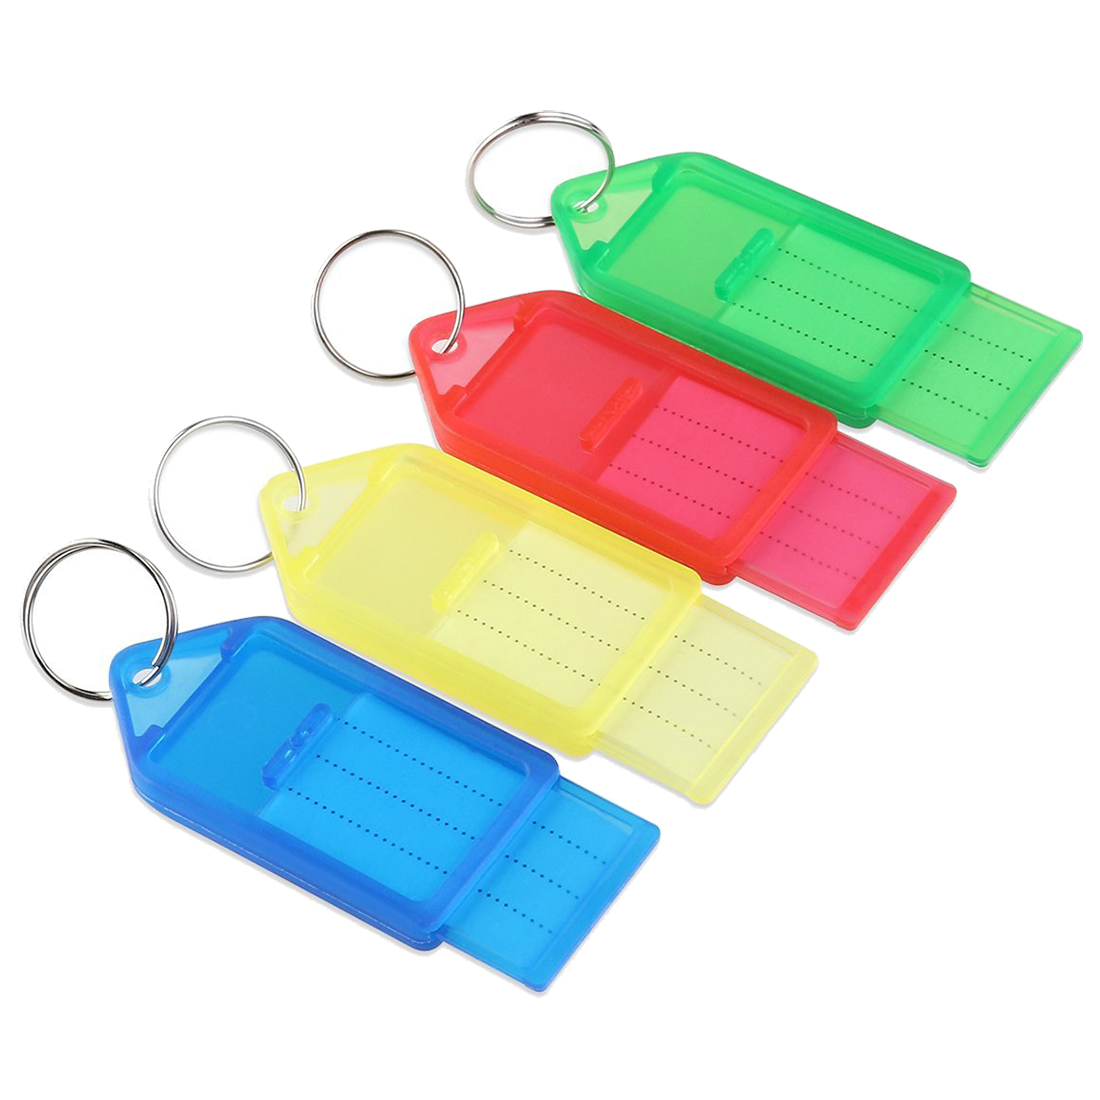 AFBC 60pcs plastic Slideable Key Fobs Luggage Tags with Key Rings Random Color